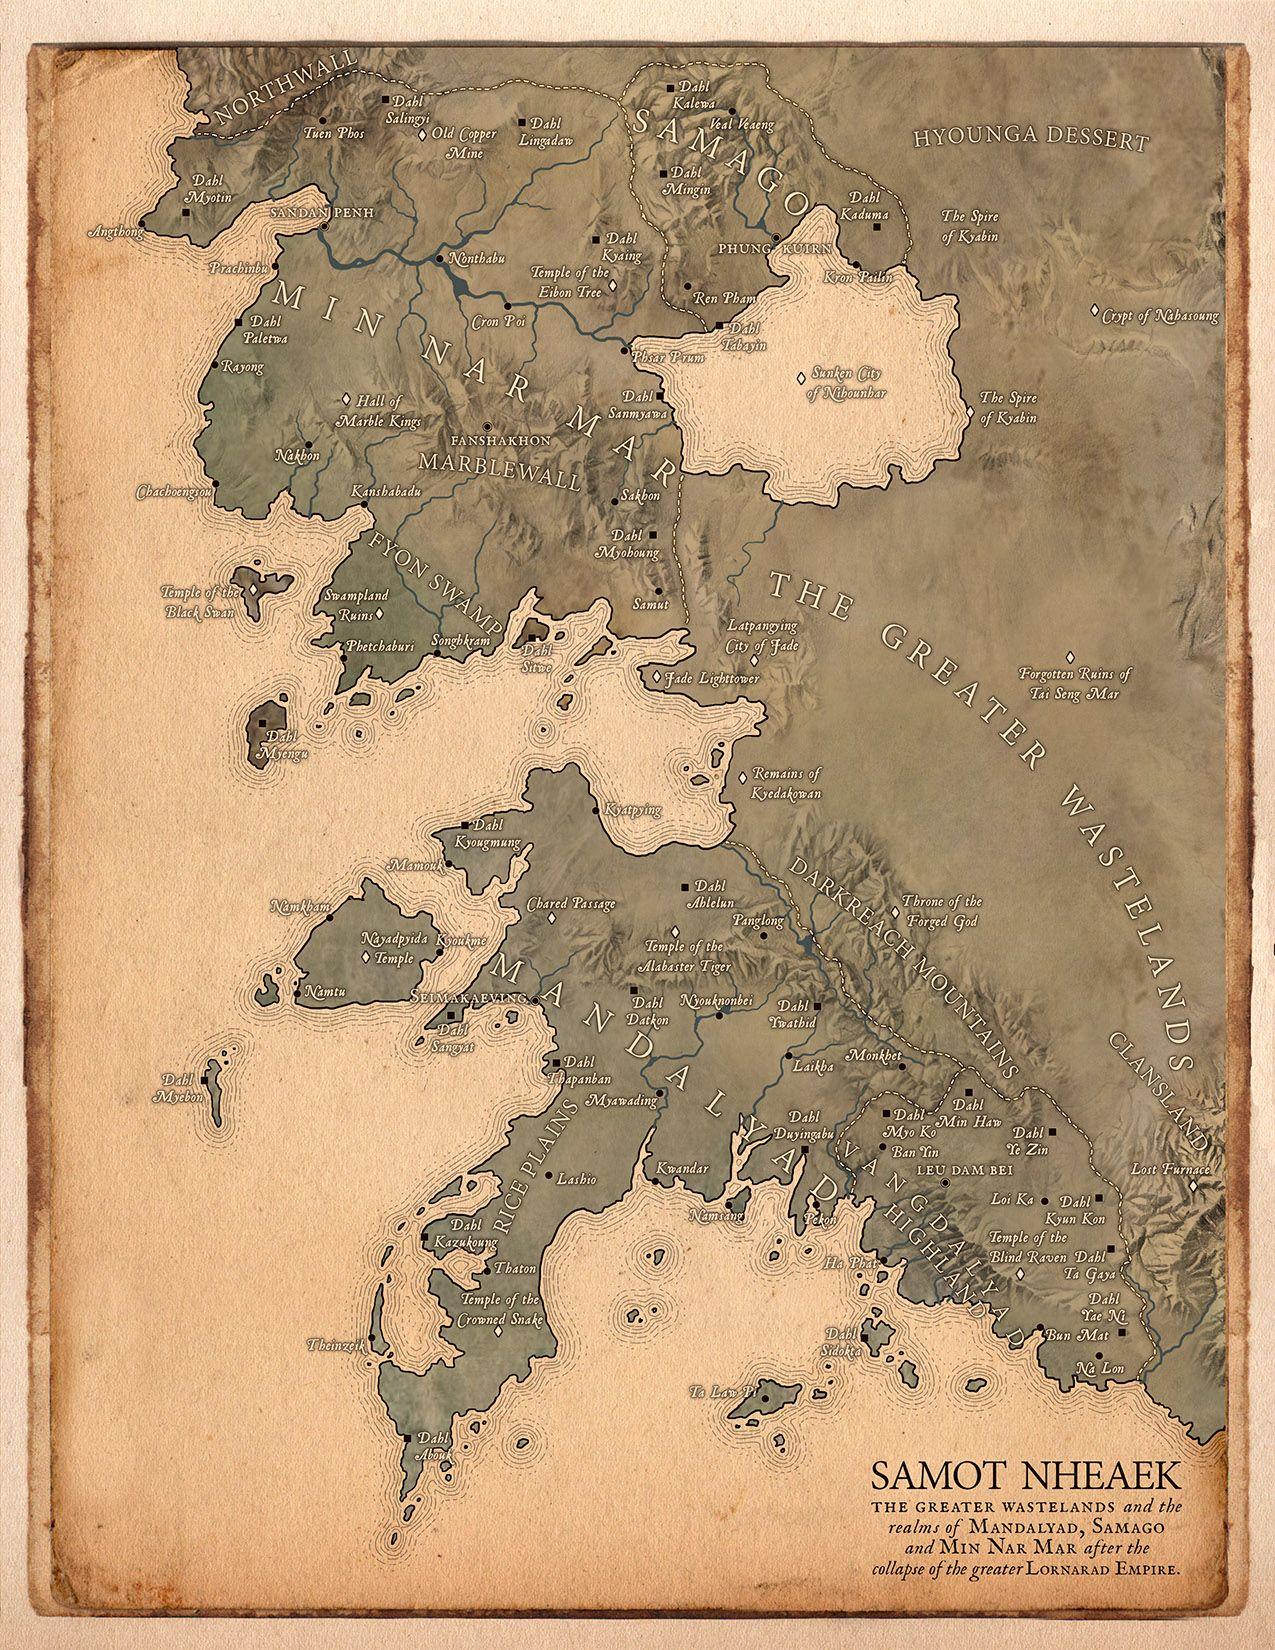 Samot Nheaek - Medium Files | Maps and Locations | Imaginary maps